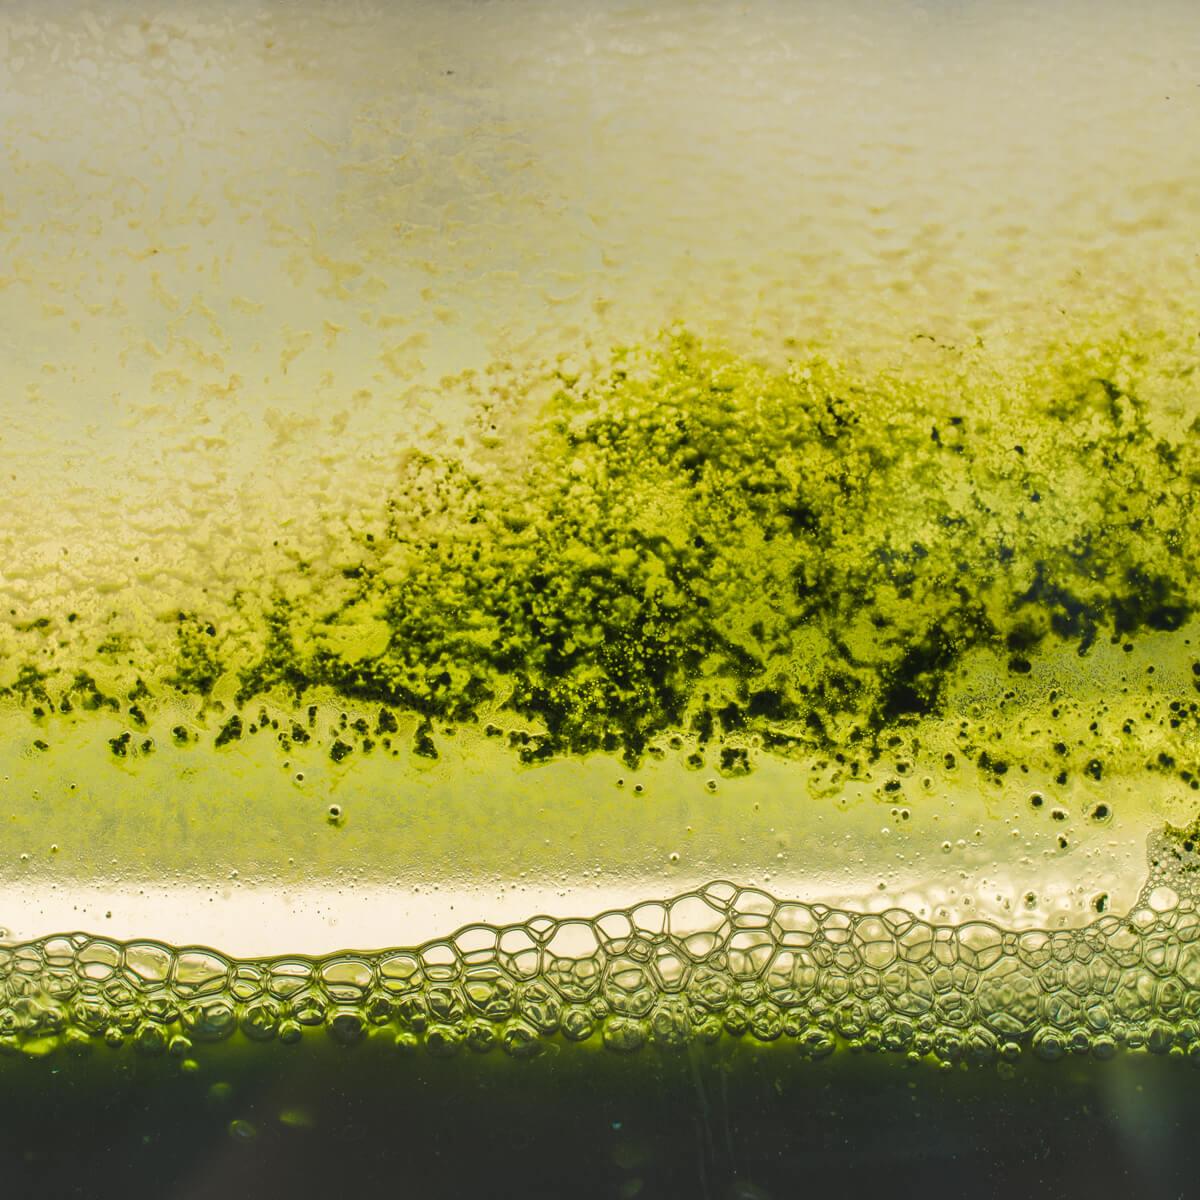 <ul> <li>استخلاص على نطاق واسع للجزيئات النشطة من أصل نباتي، ميكروبي أو طحلبي</li> <li>التركيز في حرارة منخفظة للاستخلاصات المنجزة أو لوسائل الزرع الميكروبية</li> </ul>